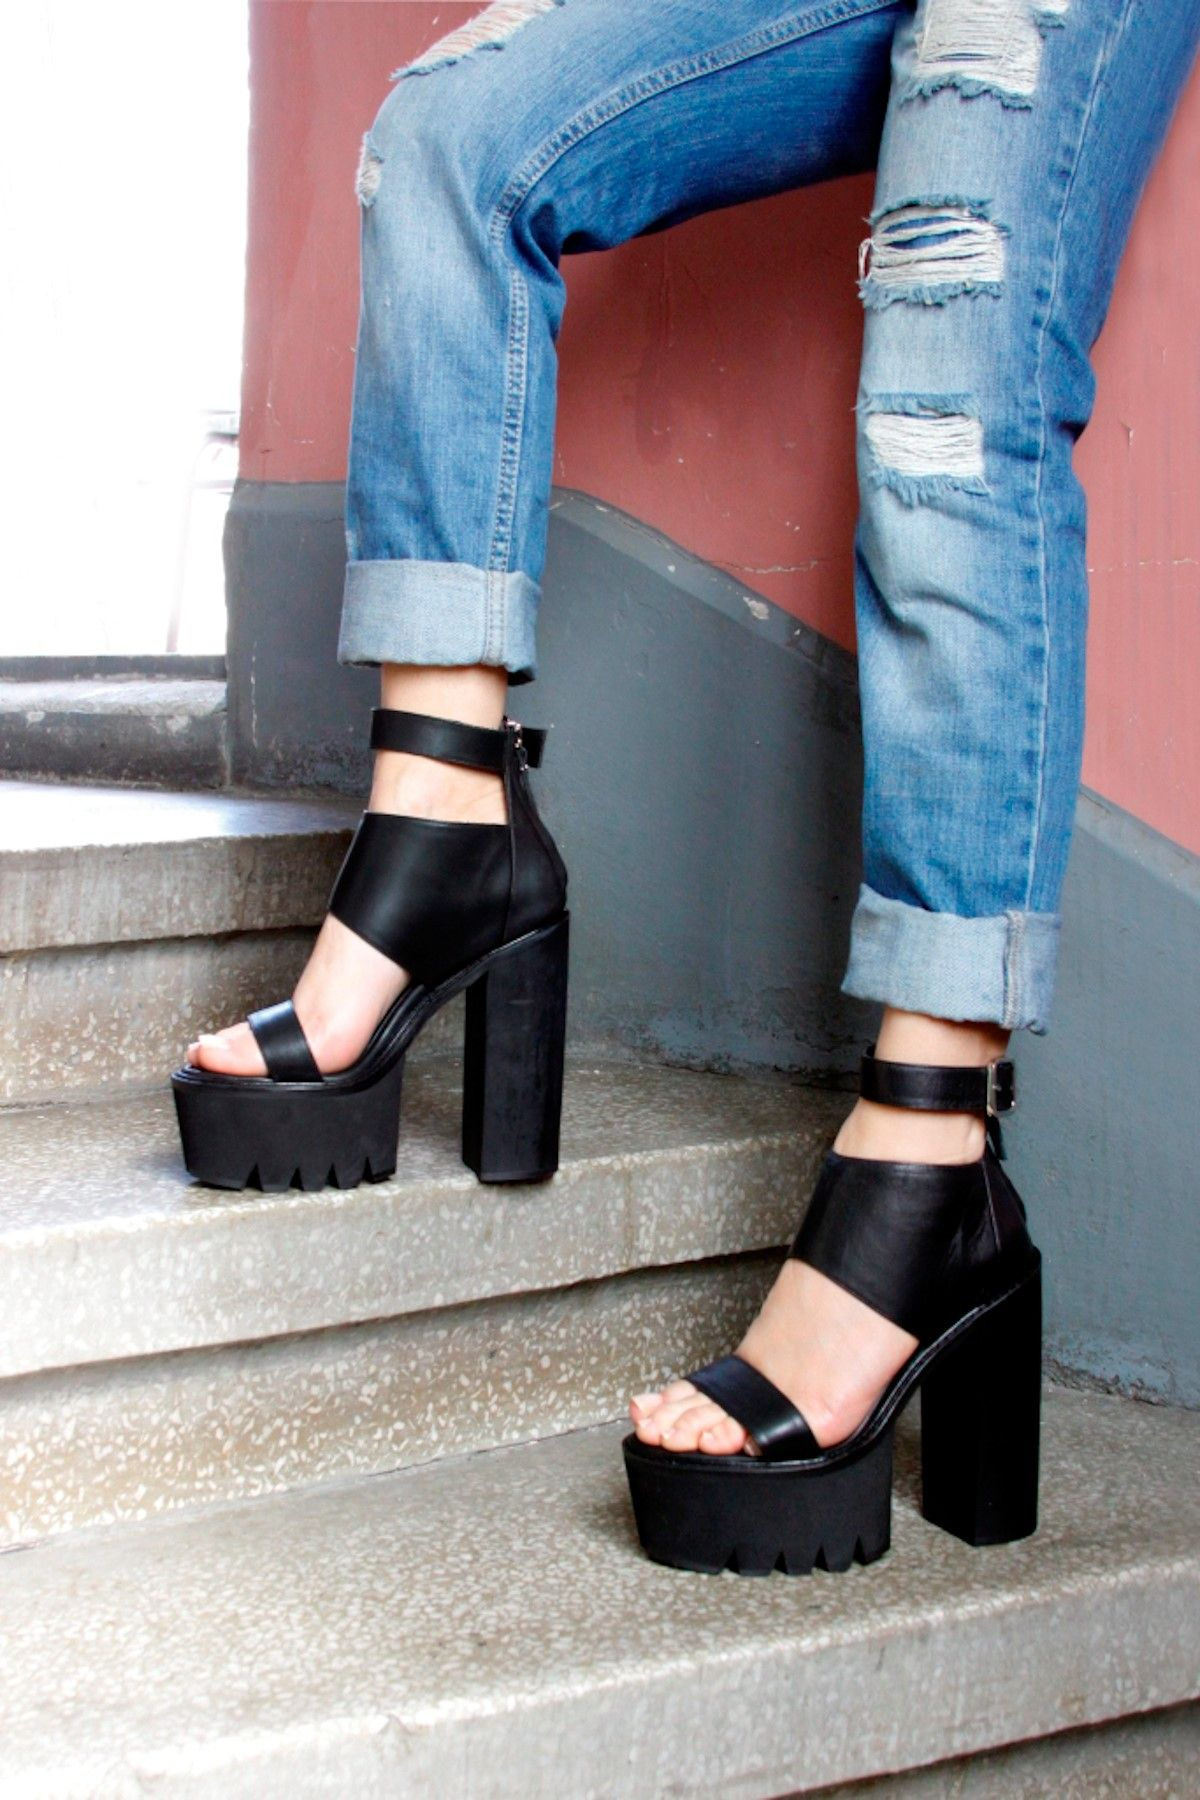 Elle Shoes Hakiki Deri Siyah Kadin Topuklu Ayakkabi Trendyol Topuklular Topuklu Ayakkabilar Ayakkabilar